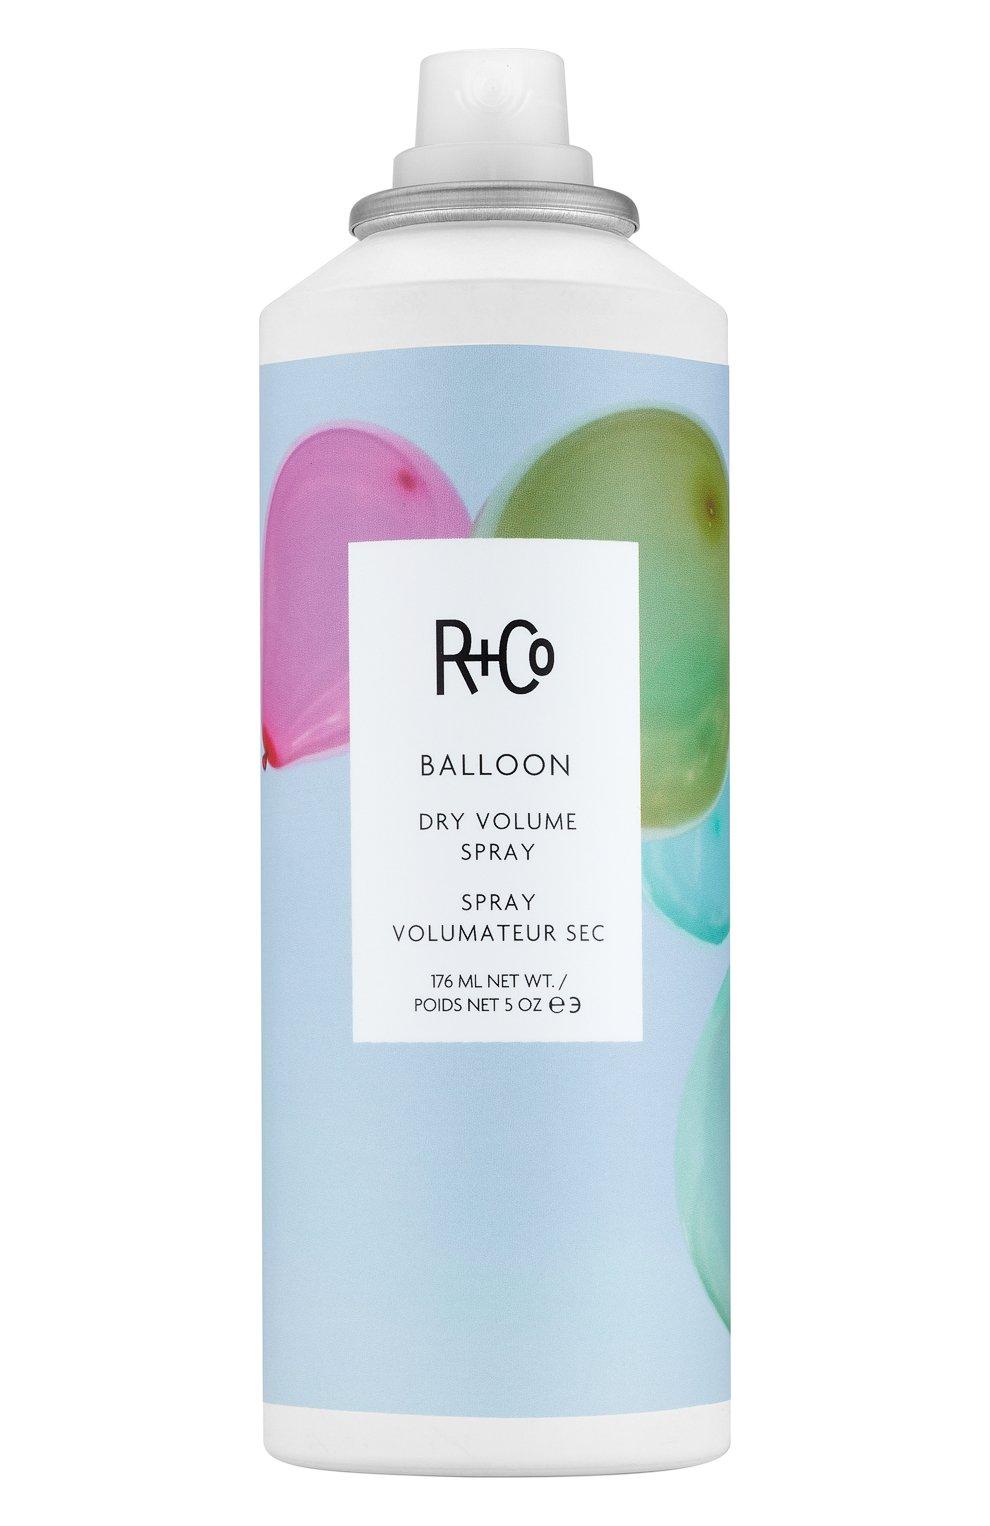 Сухой текстурирующий спрей для объема balloon (176ml) R+CO бесцветного цвета, арт. 810374024553 | Фото 1